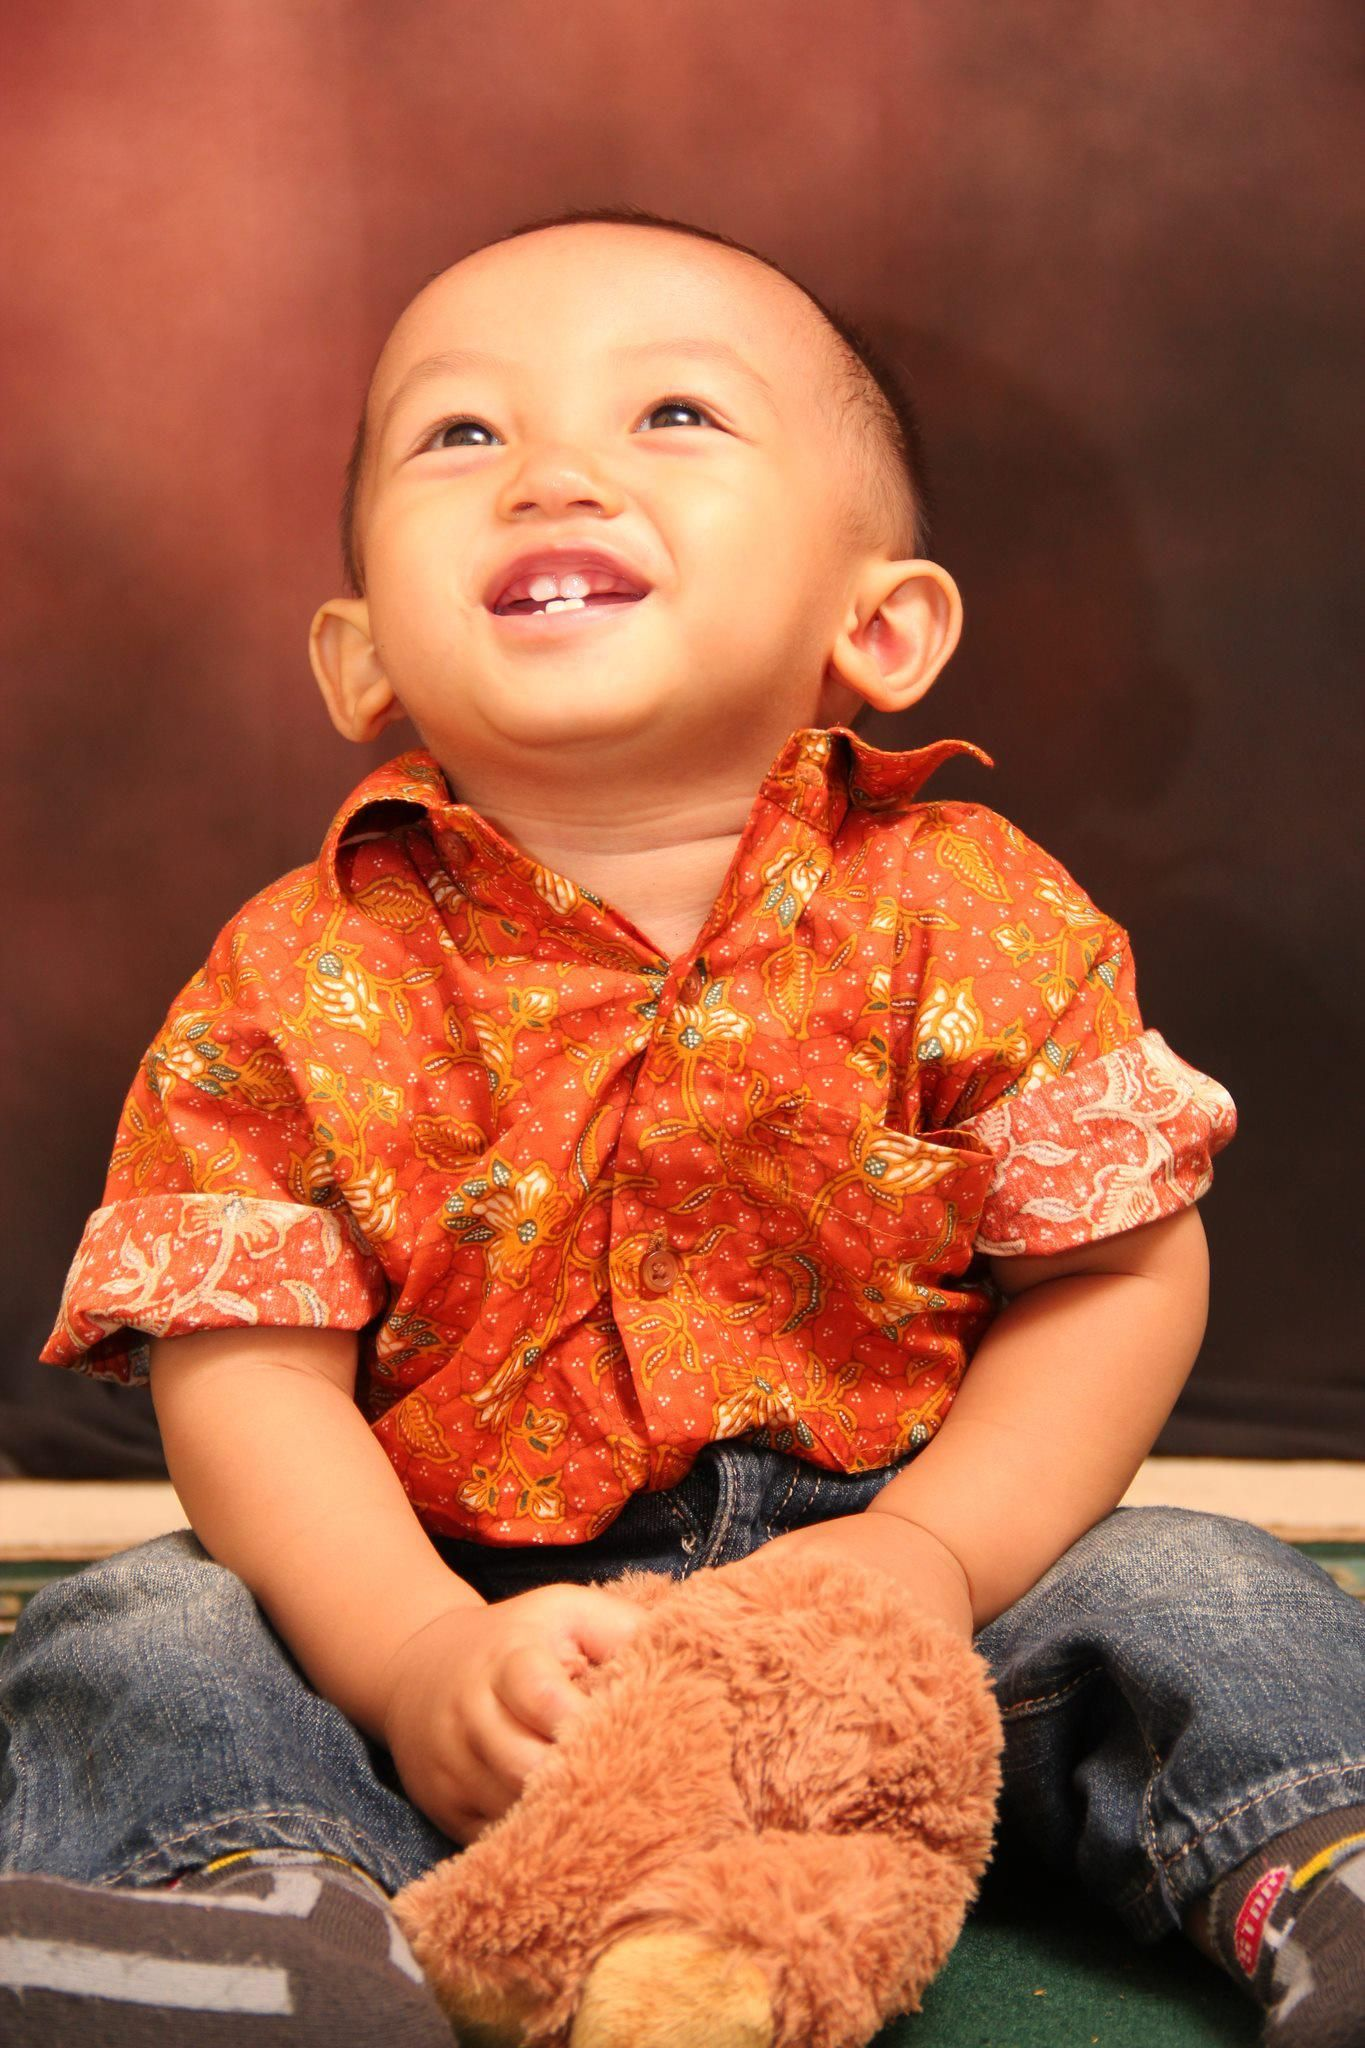 Rashya dengan Batik Keris Foto oleh Ibu Lia Libri dari Cibubur Terima kasih atas